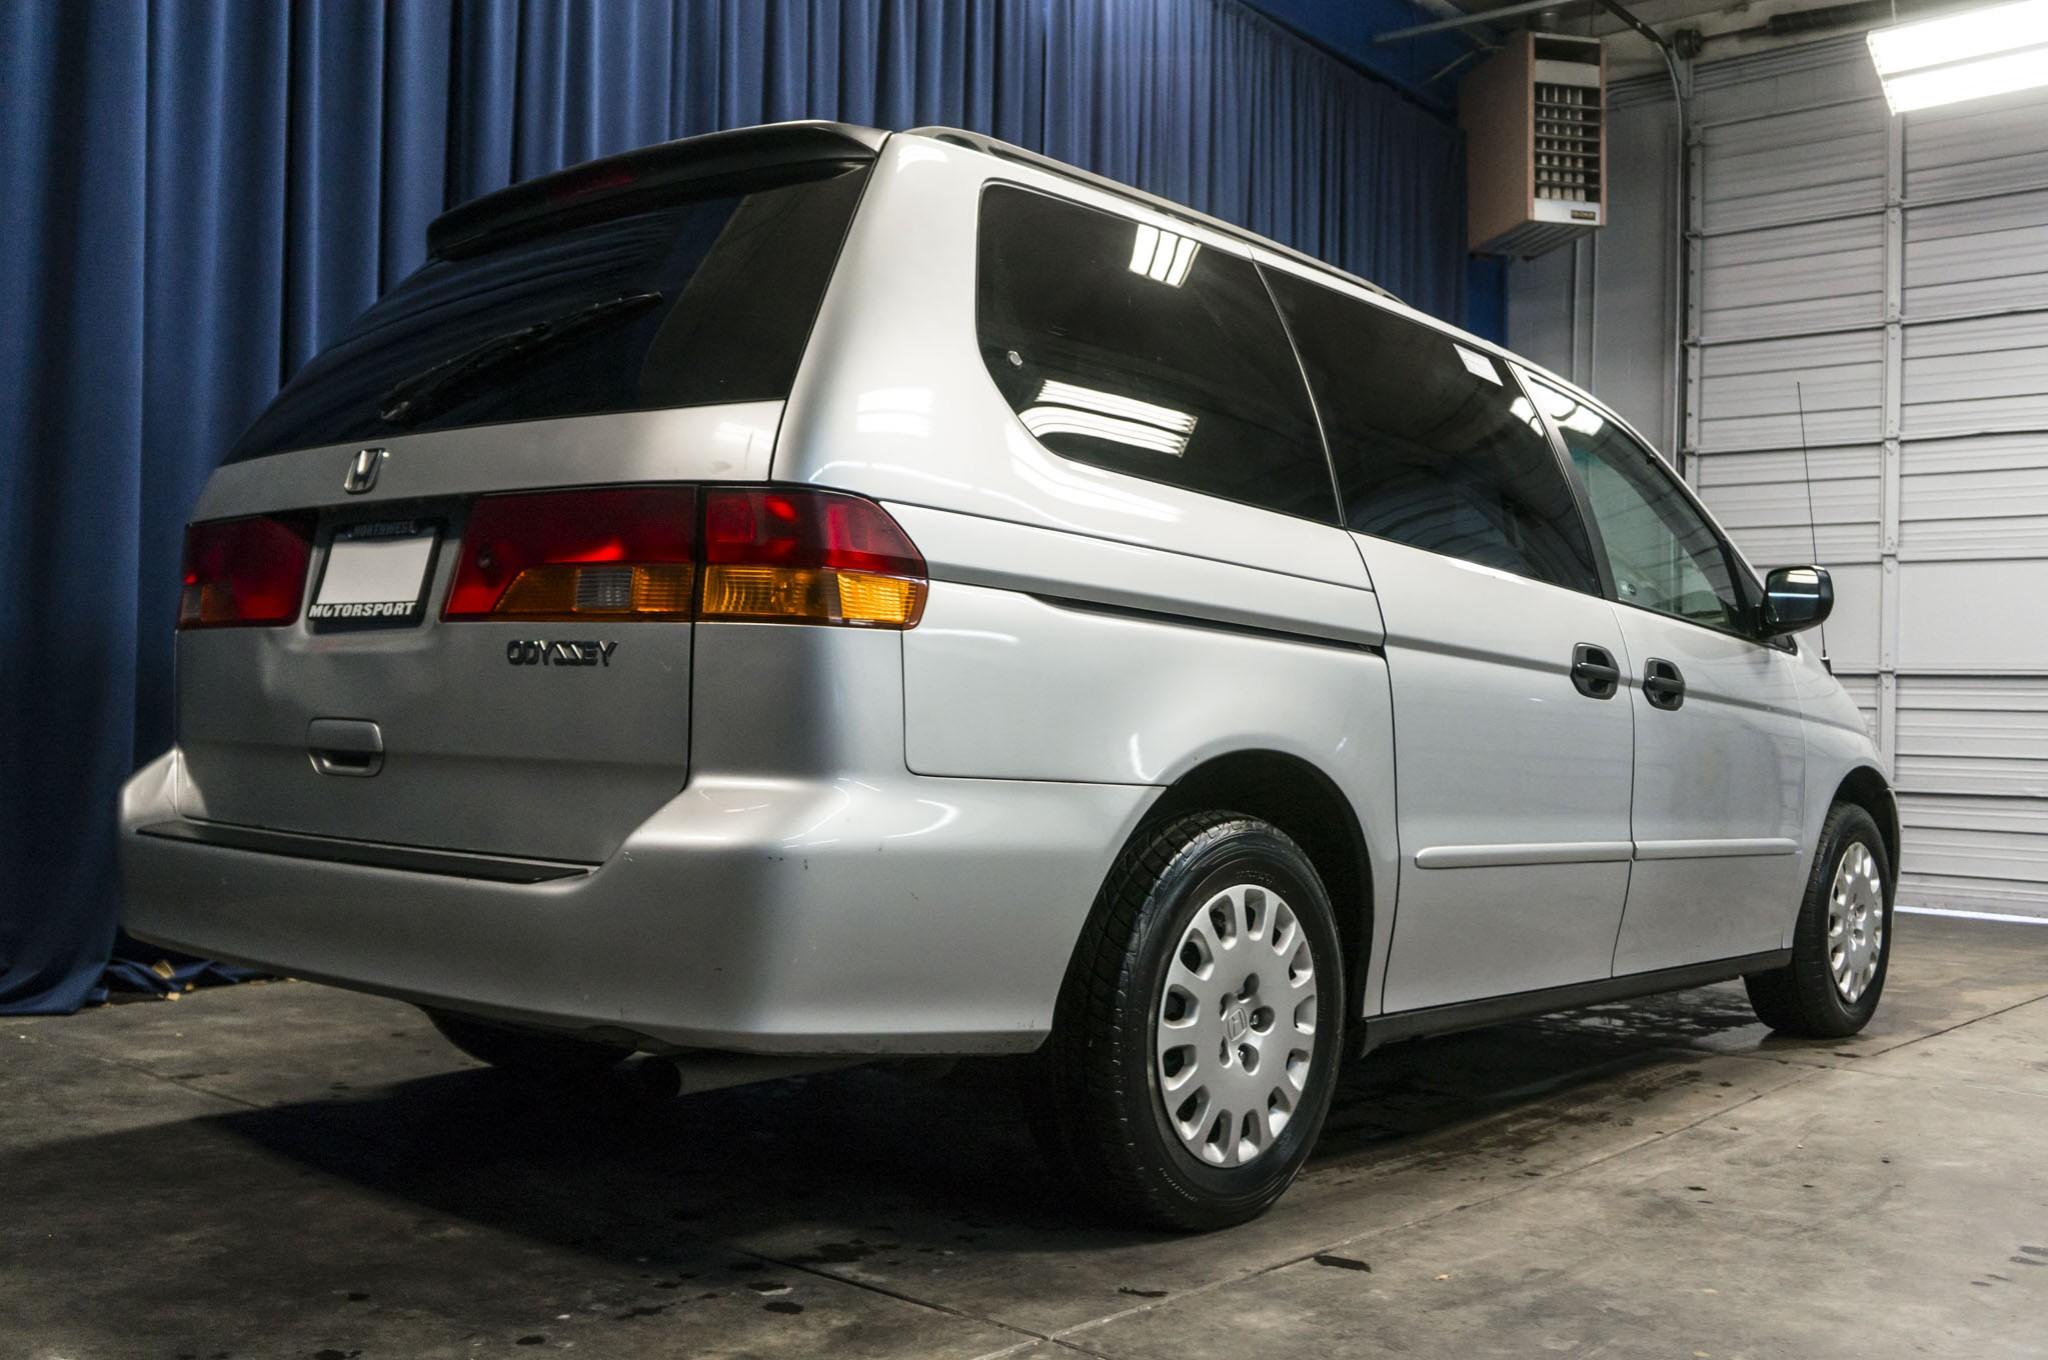 Used 2002 honda odyssey lx fwd minivan van for sale 33085c for Honda odyssey minivan